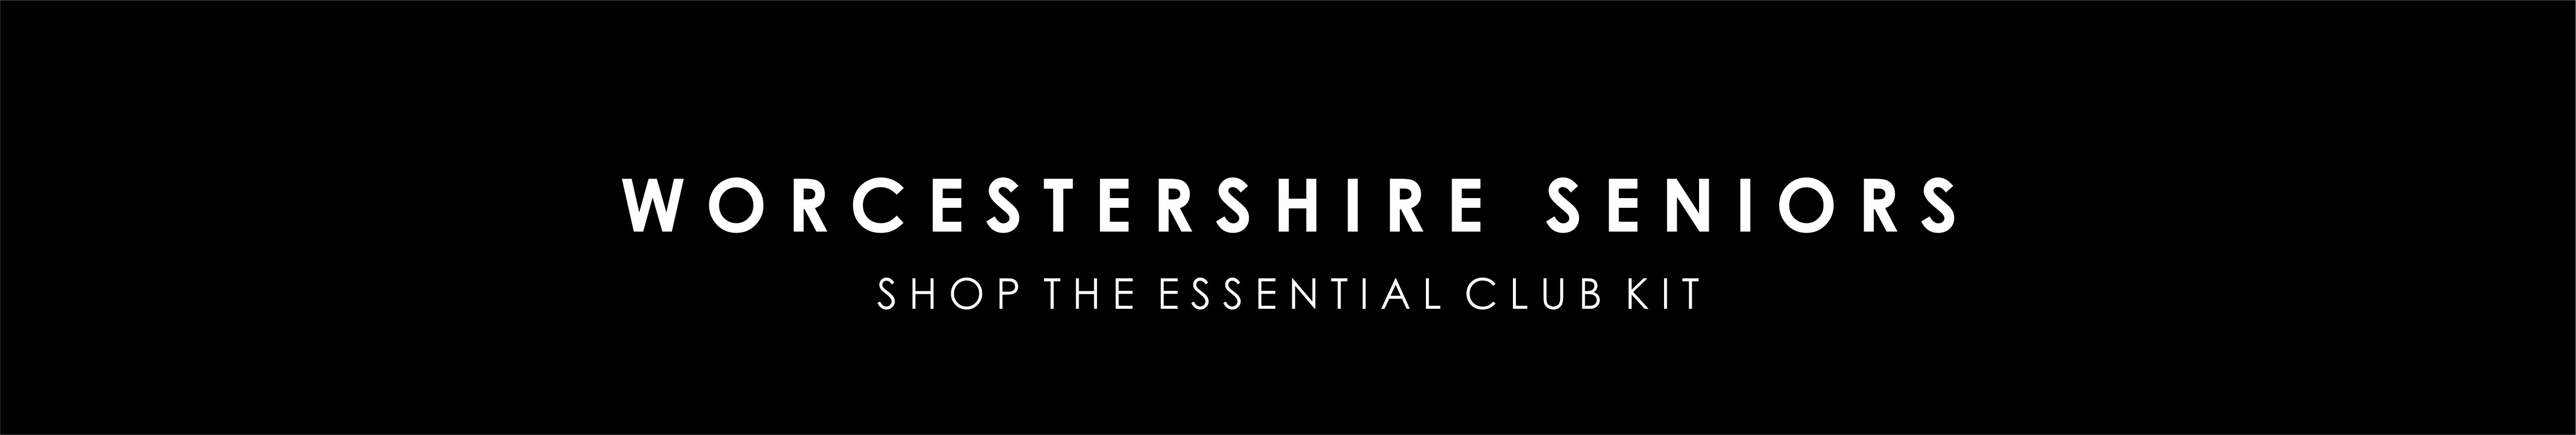 worcestershire-ccc-seniors-clubshop-banner.jpg